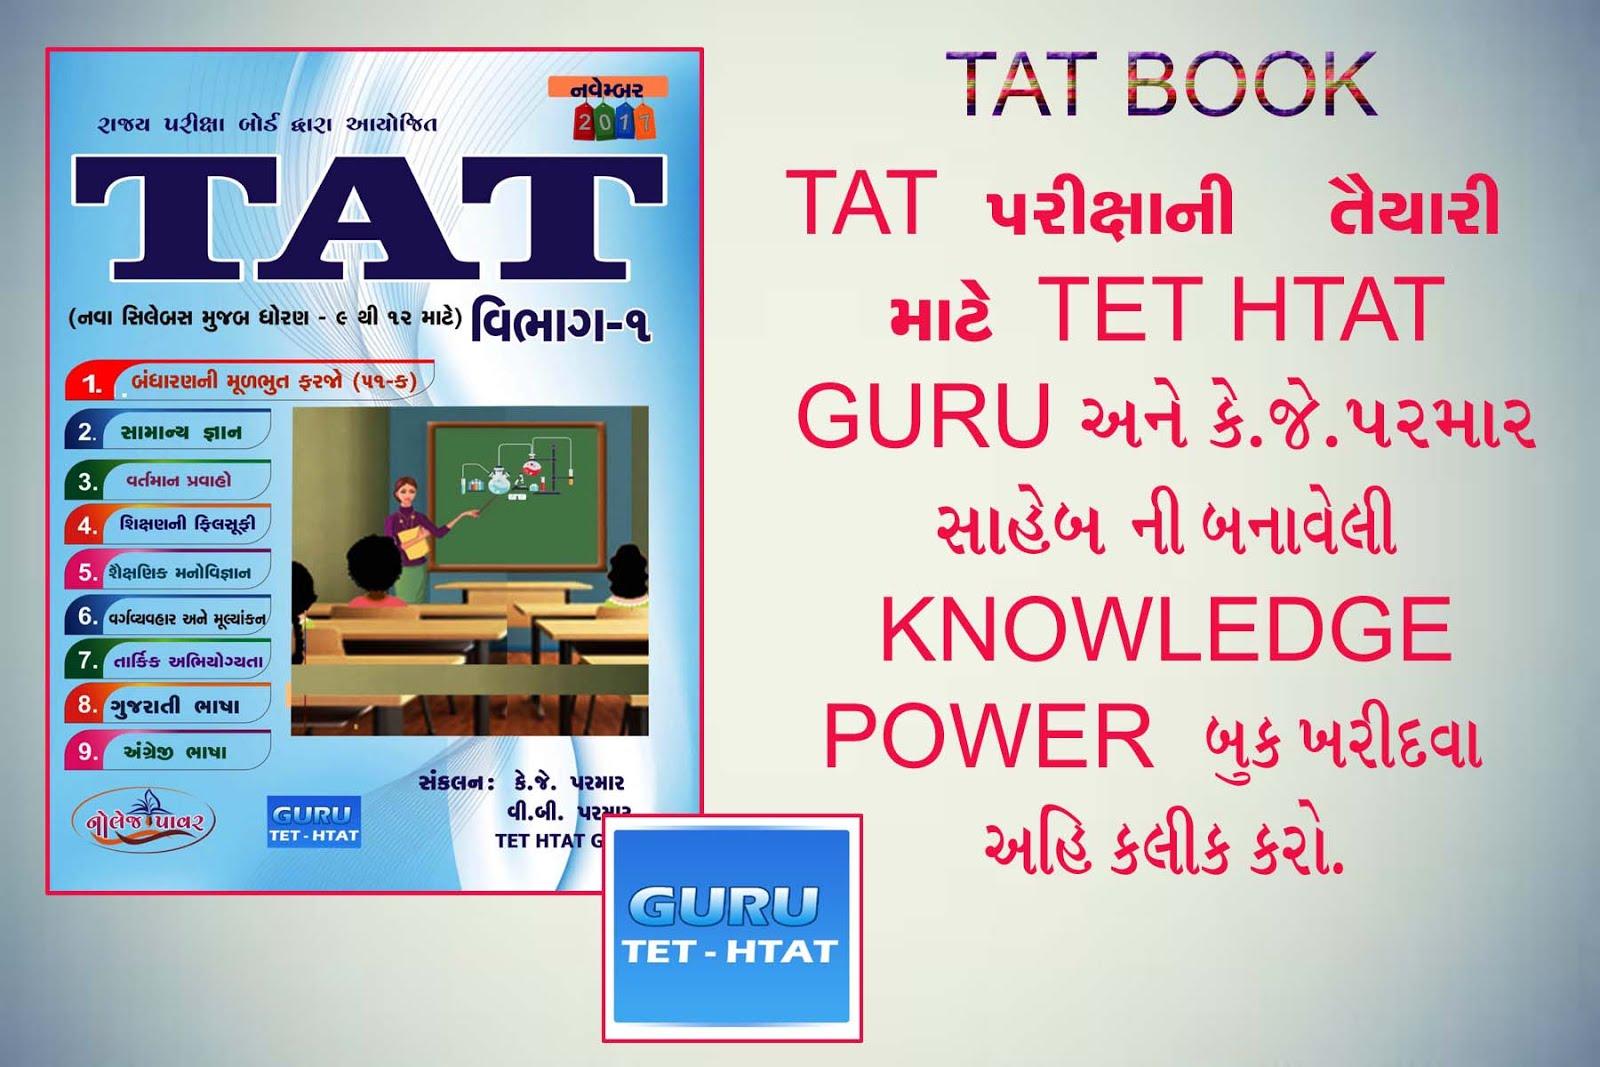 TAT BOOK